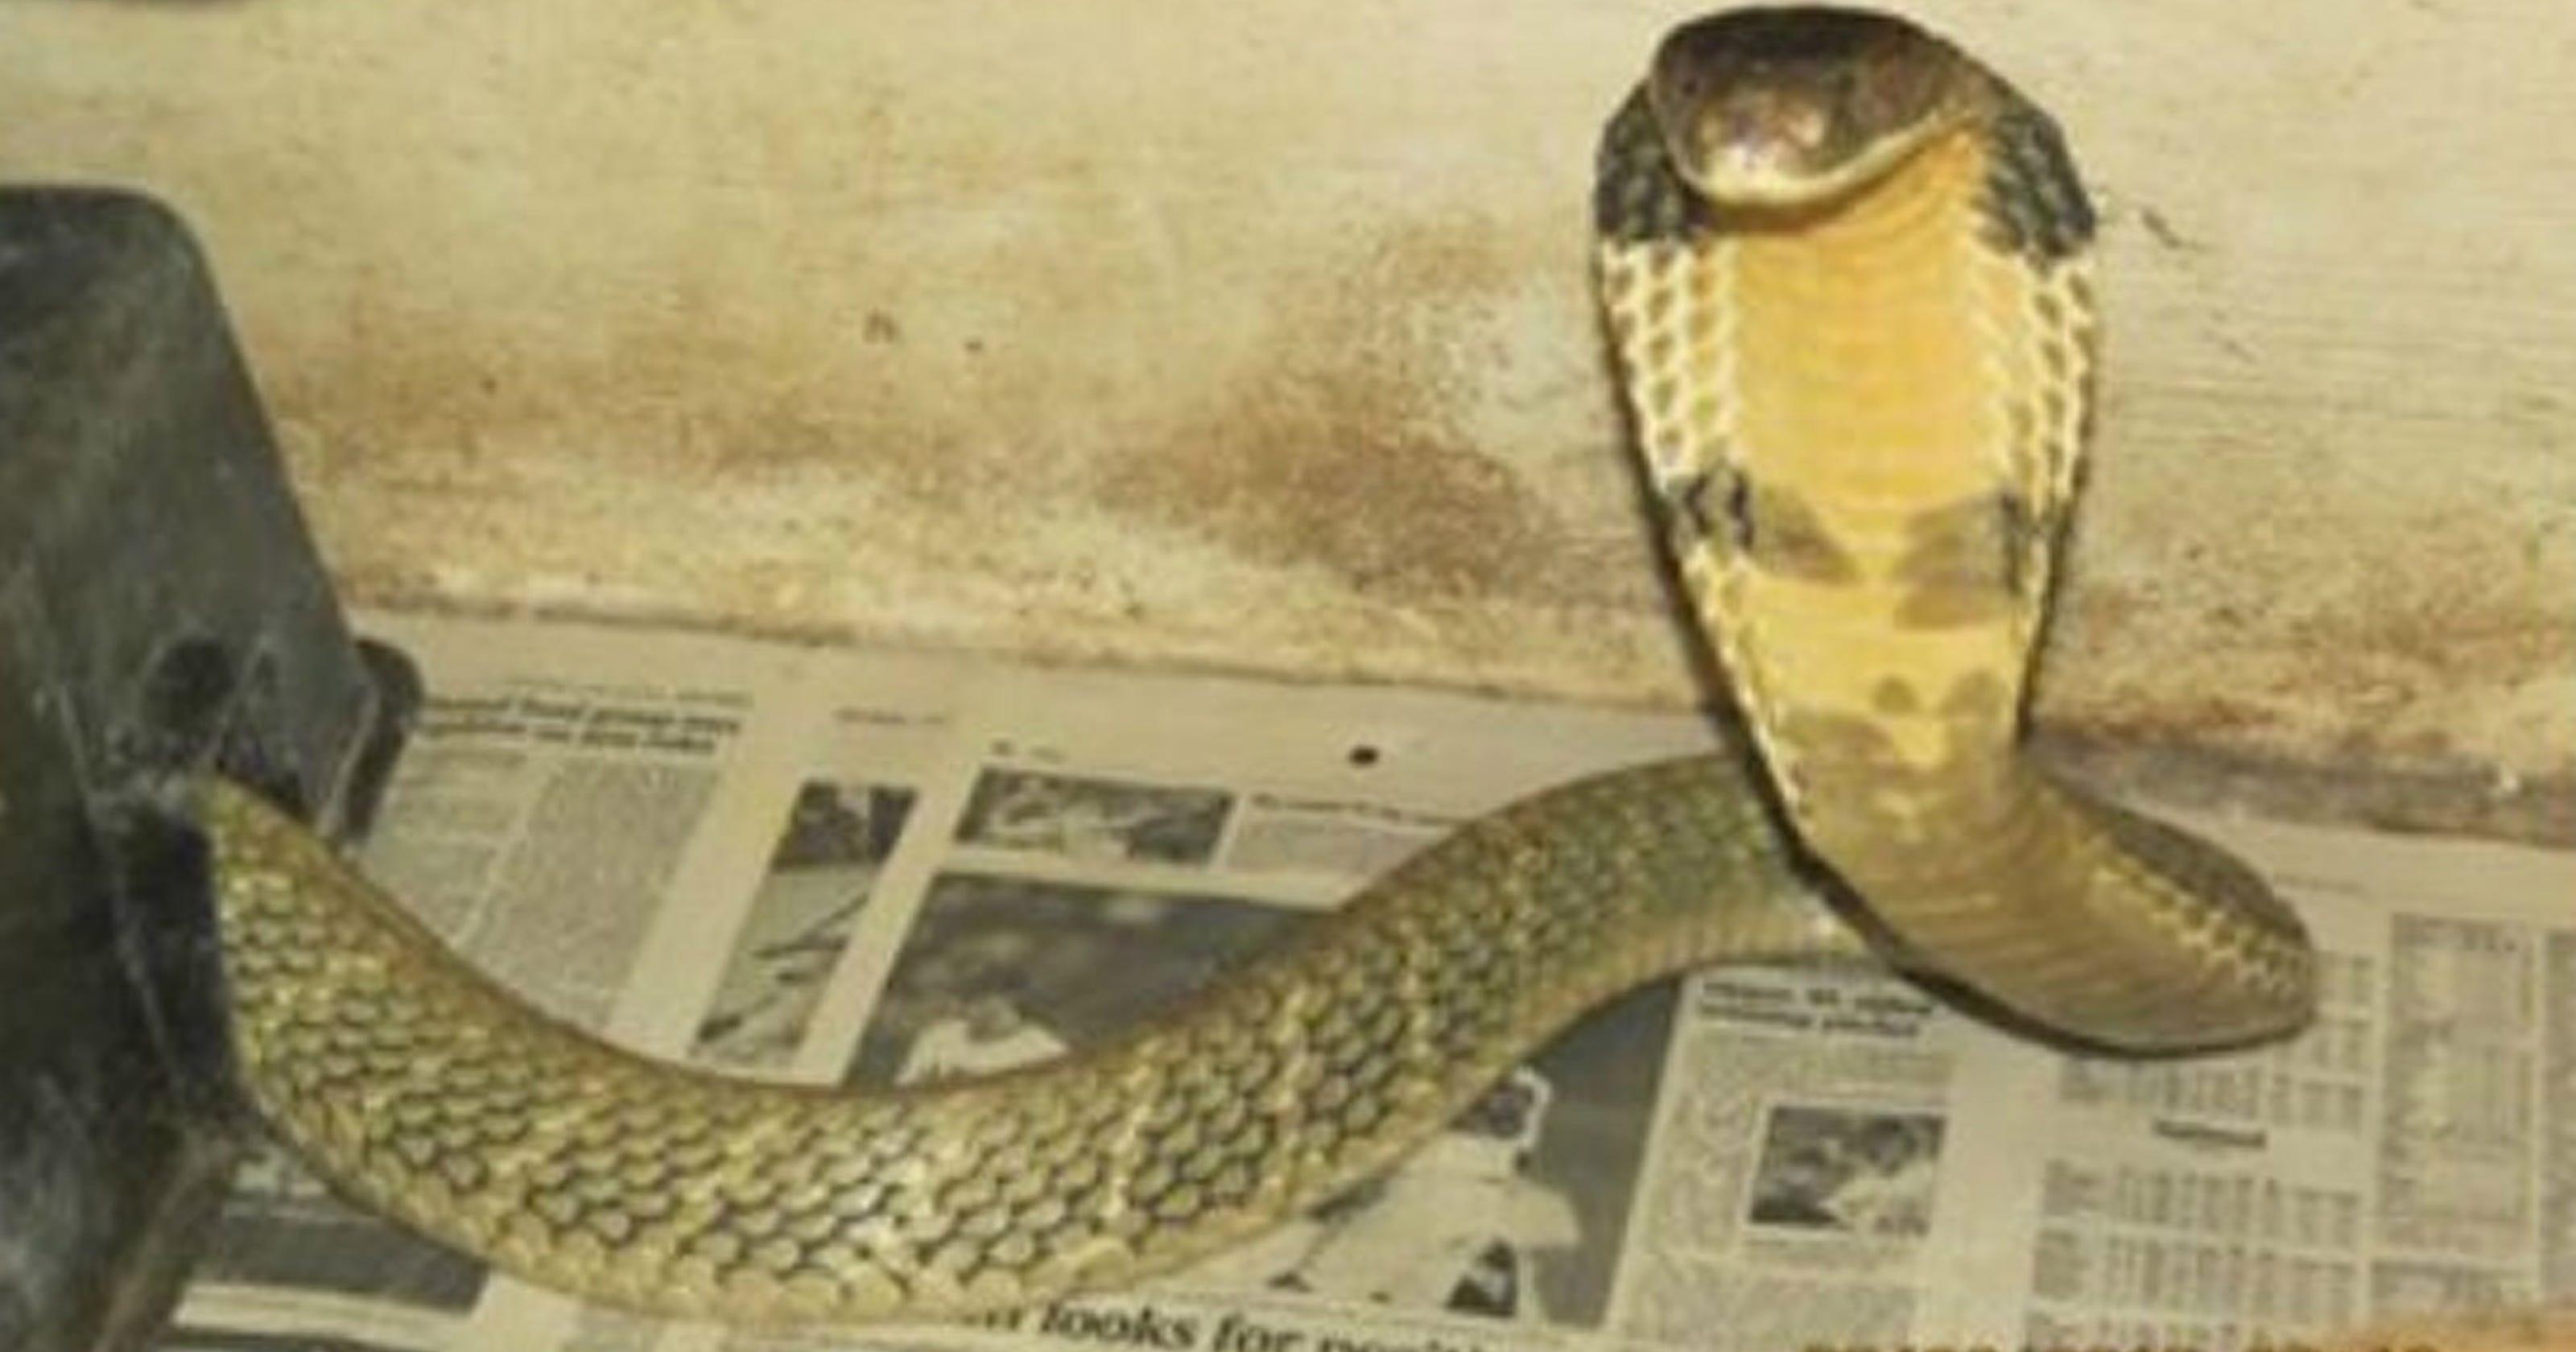 Missing King Cobra Found Hissing Behind Dryer